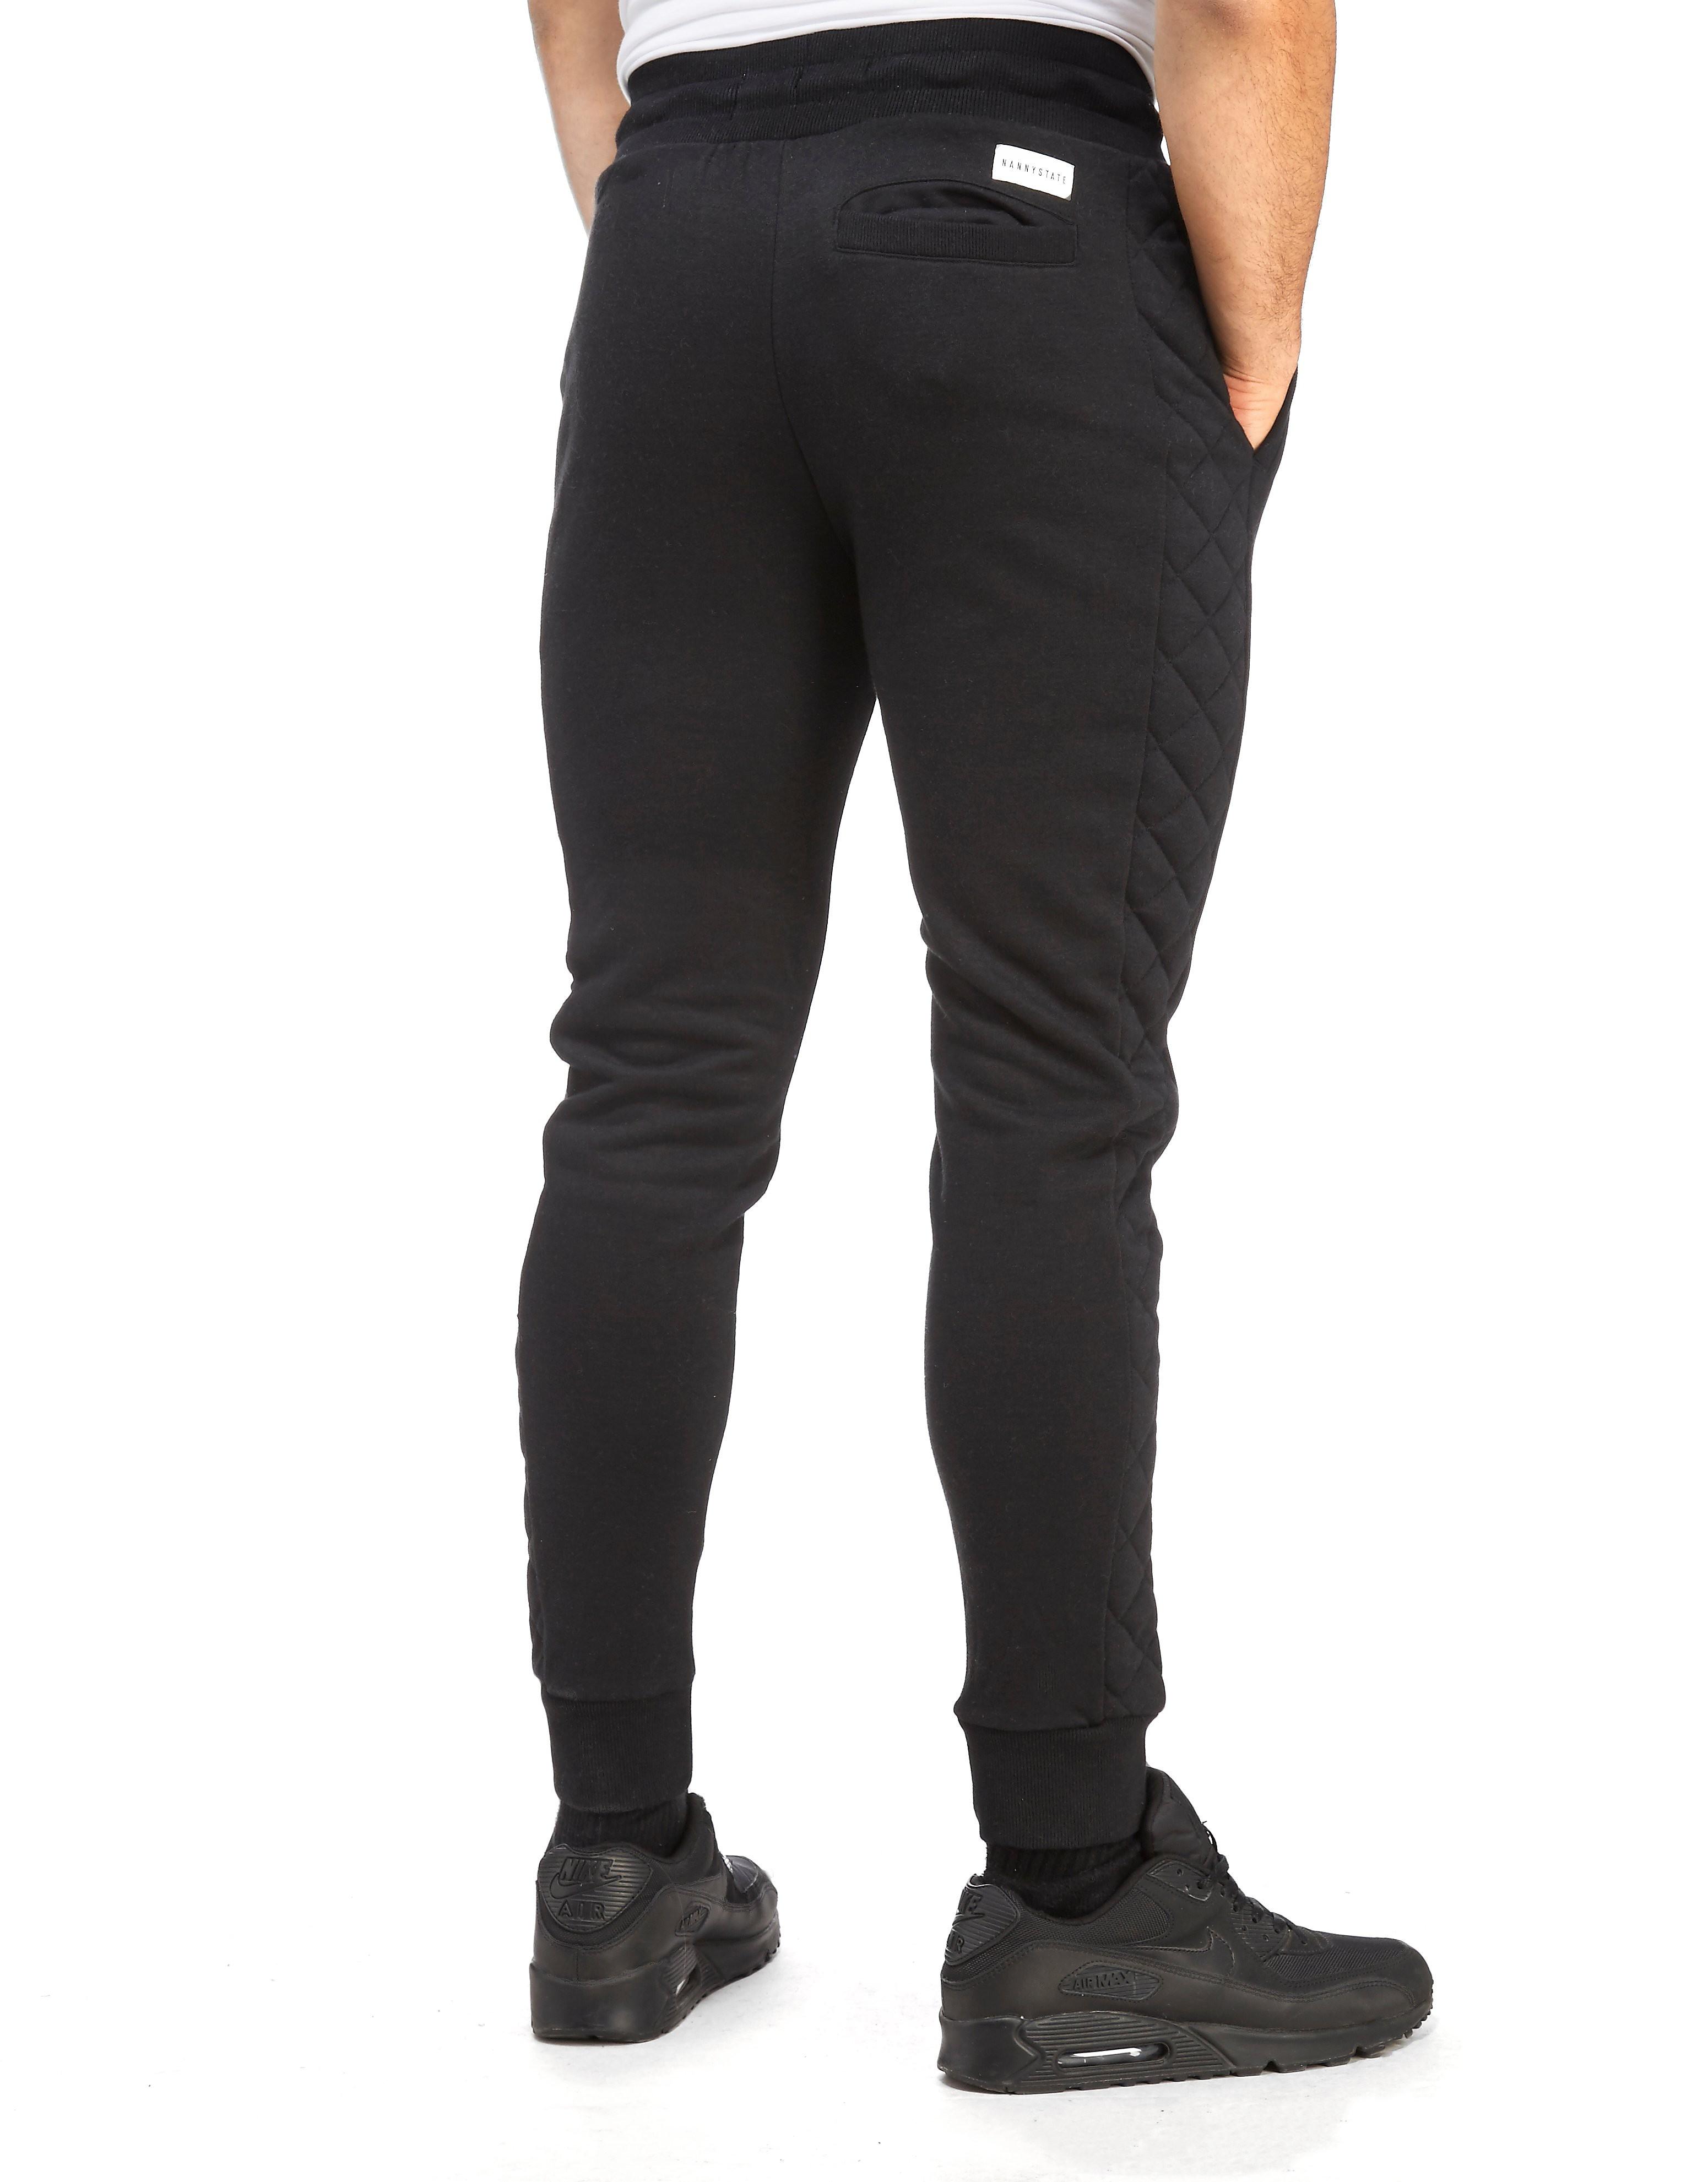 Nanny State Denton Slim Pants